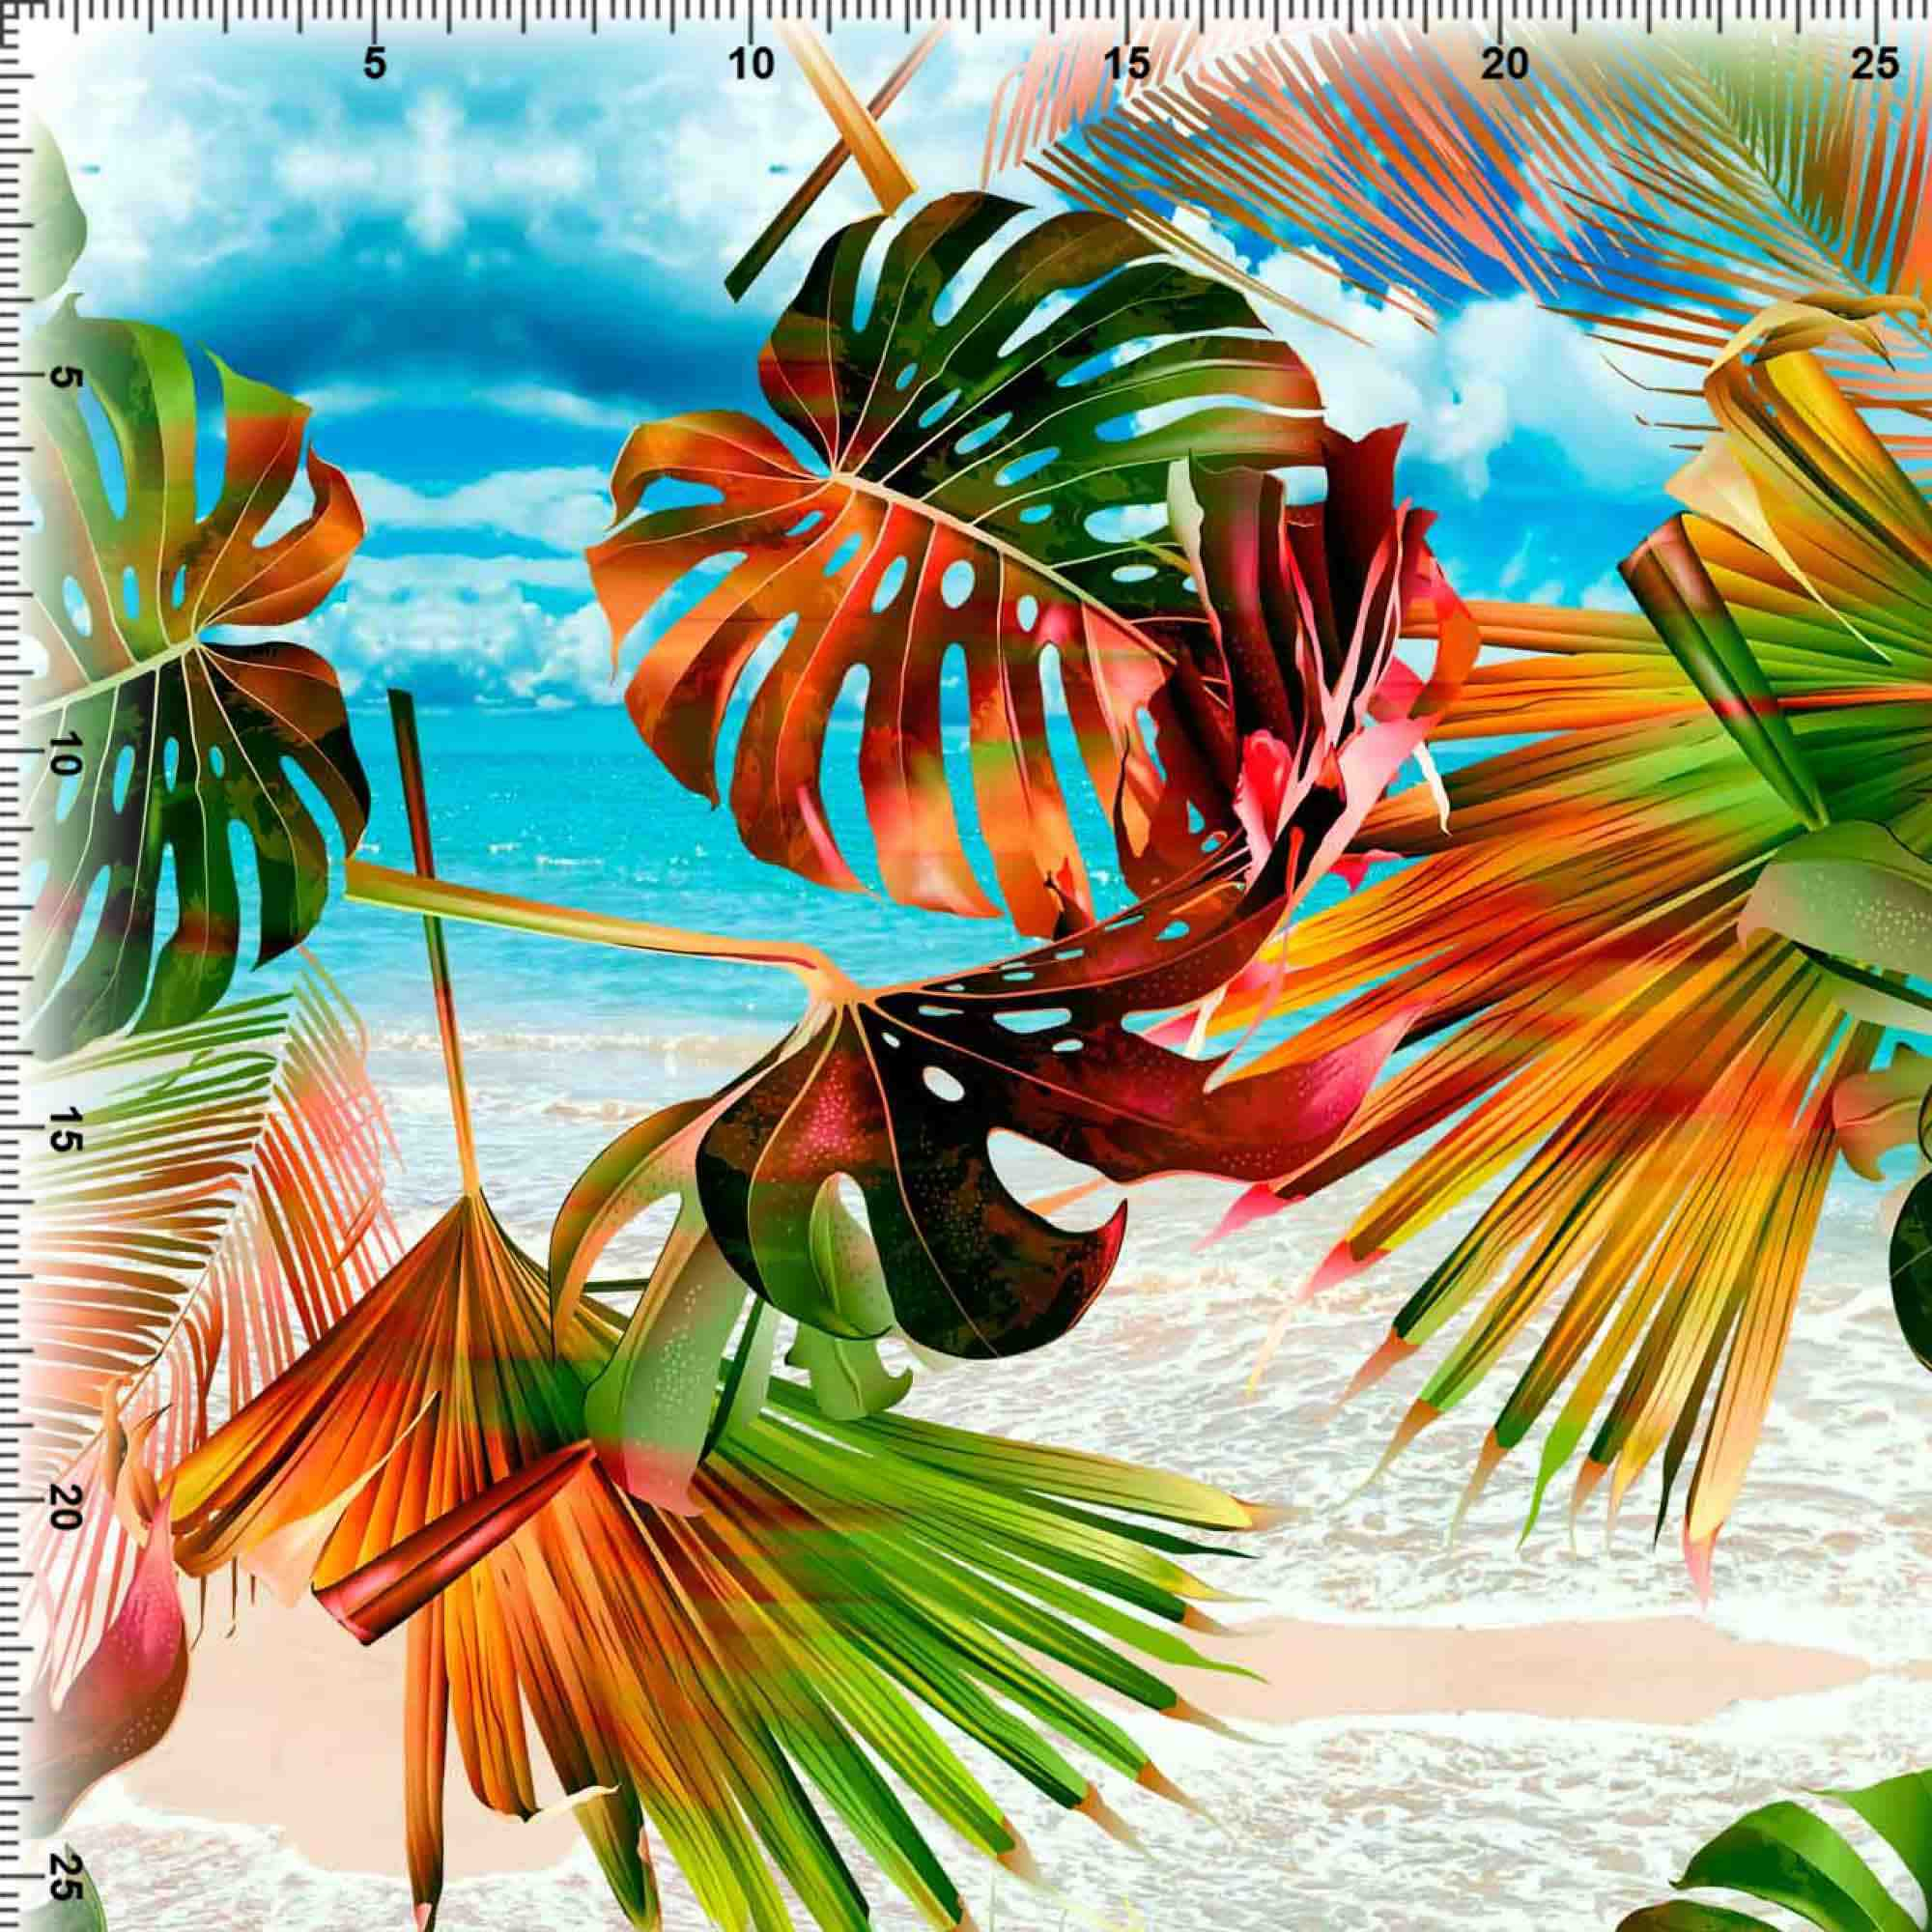 Meryl Digital Estampado (58560-1)